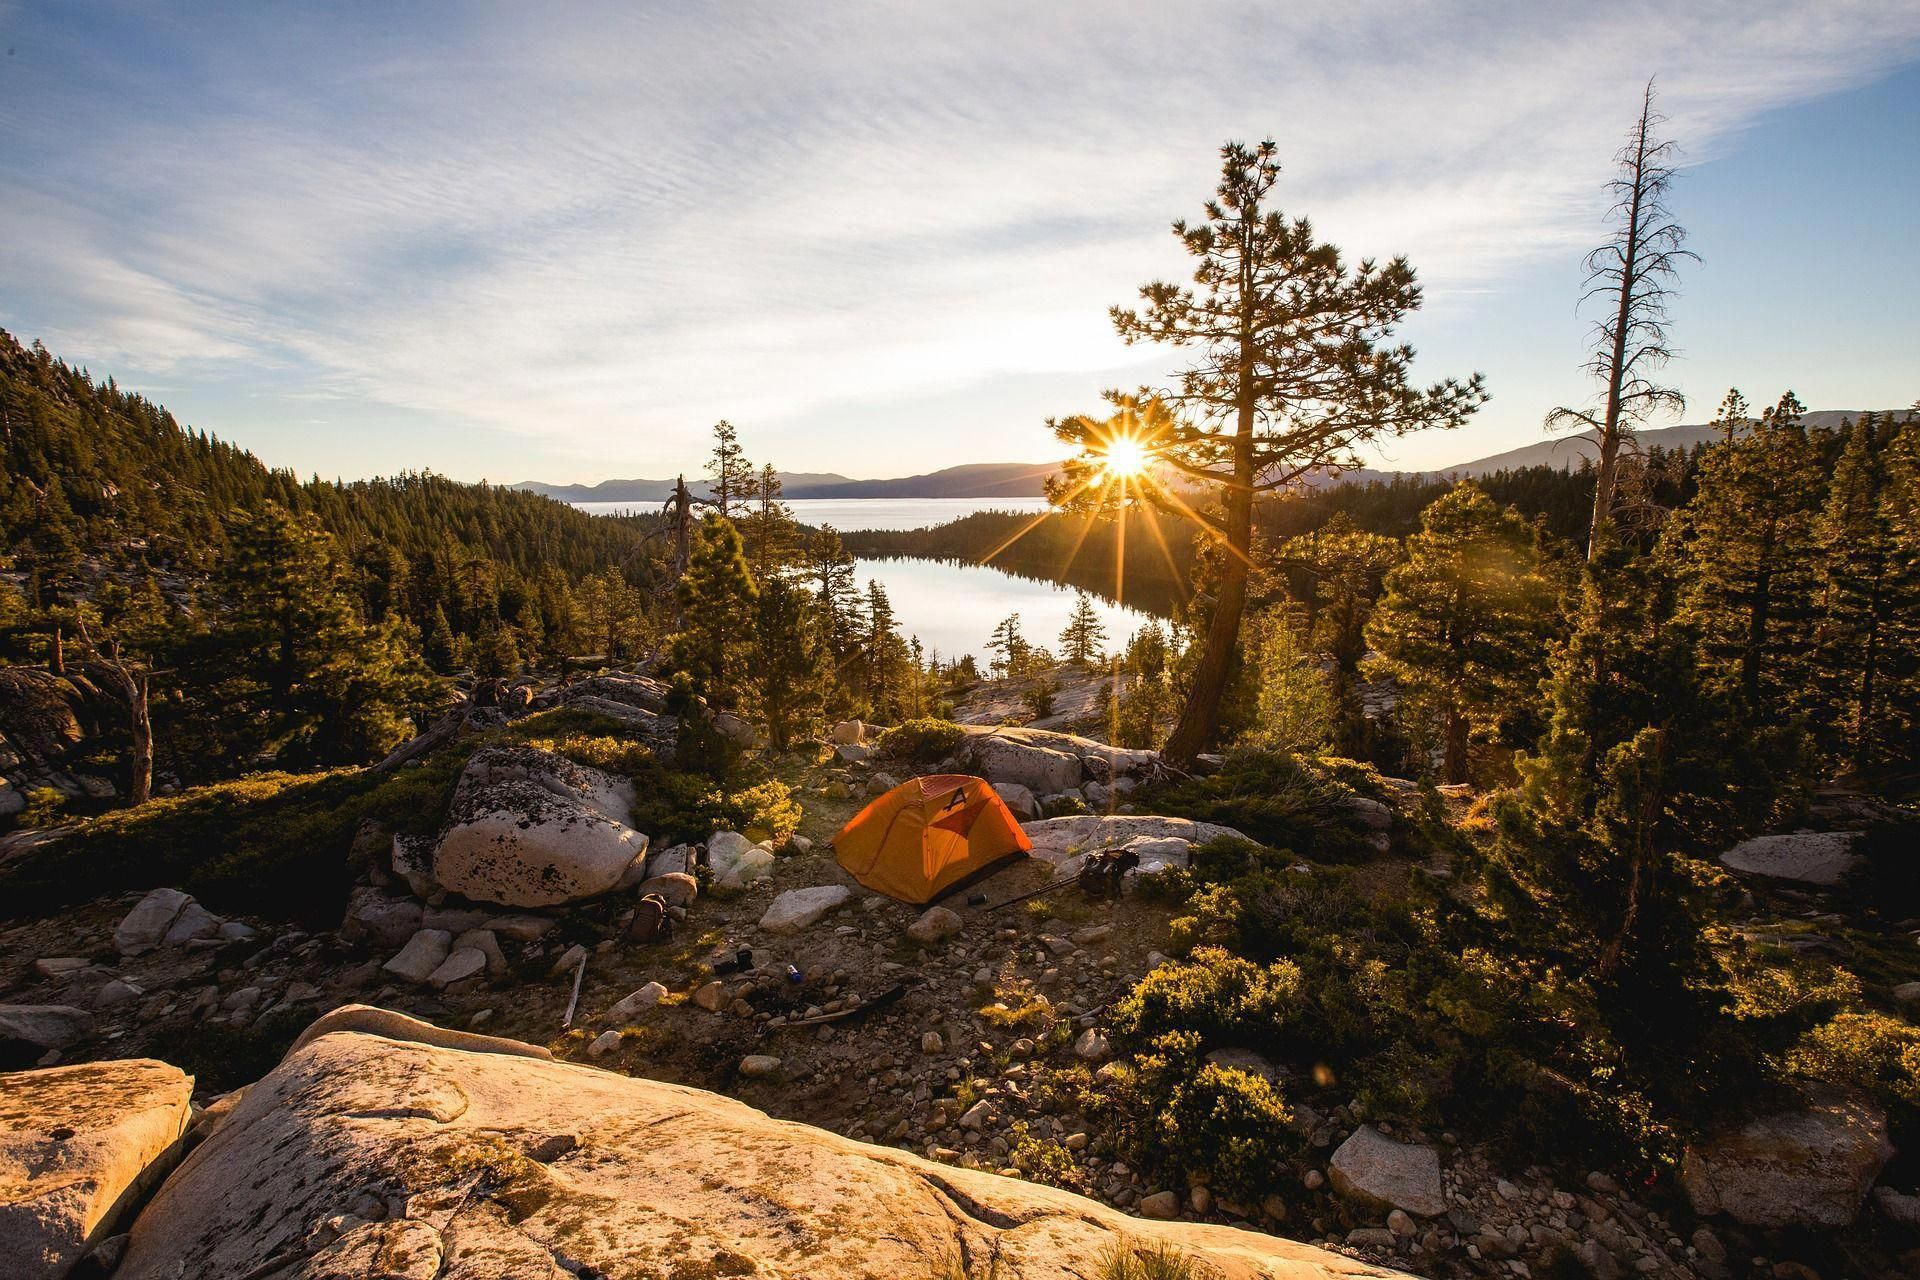 Camping Cabins Near San Diego - cabin